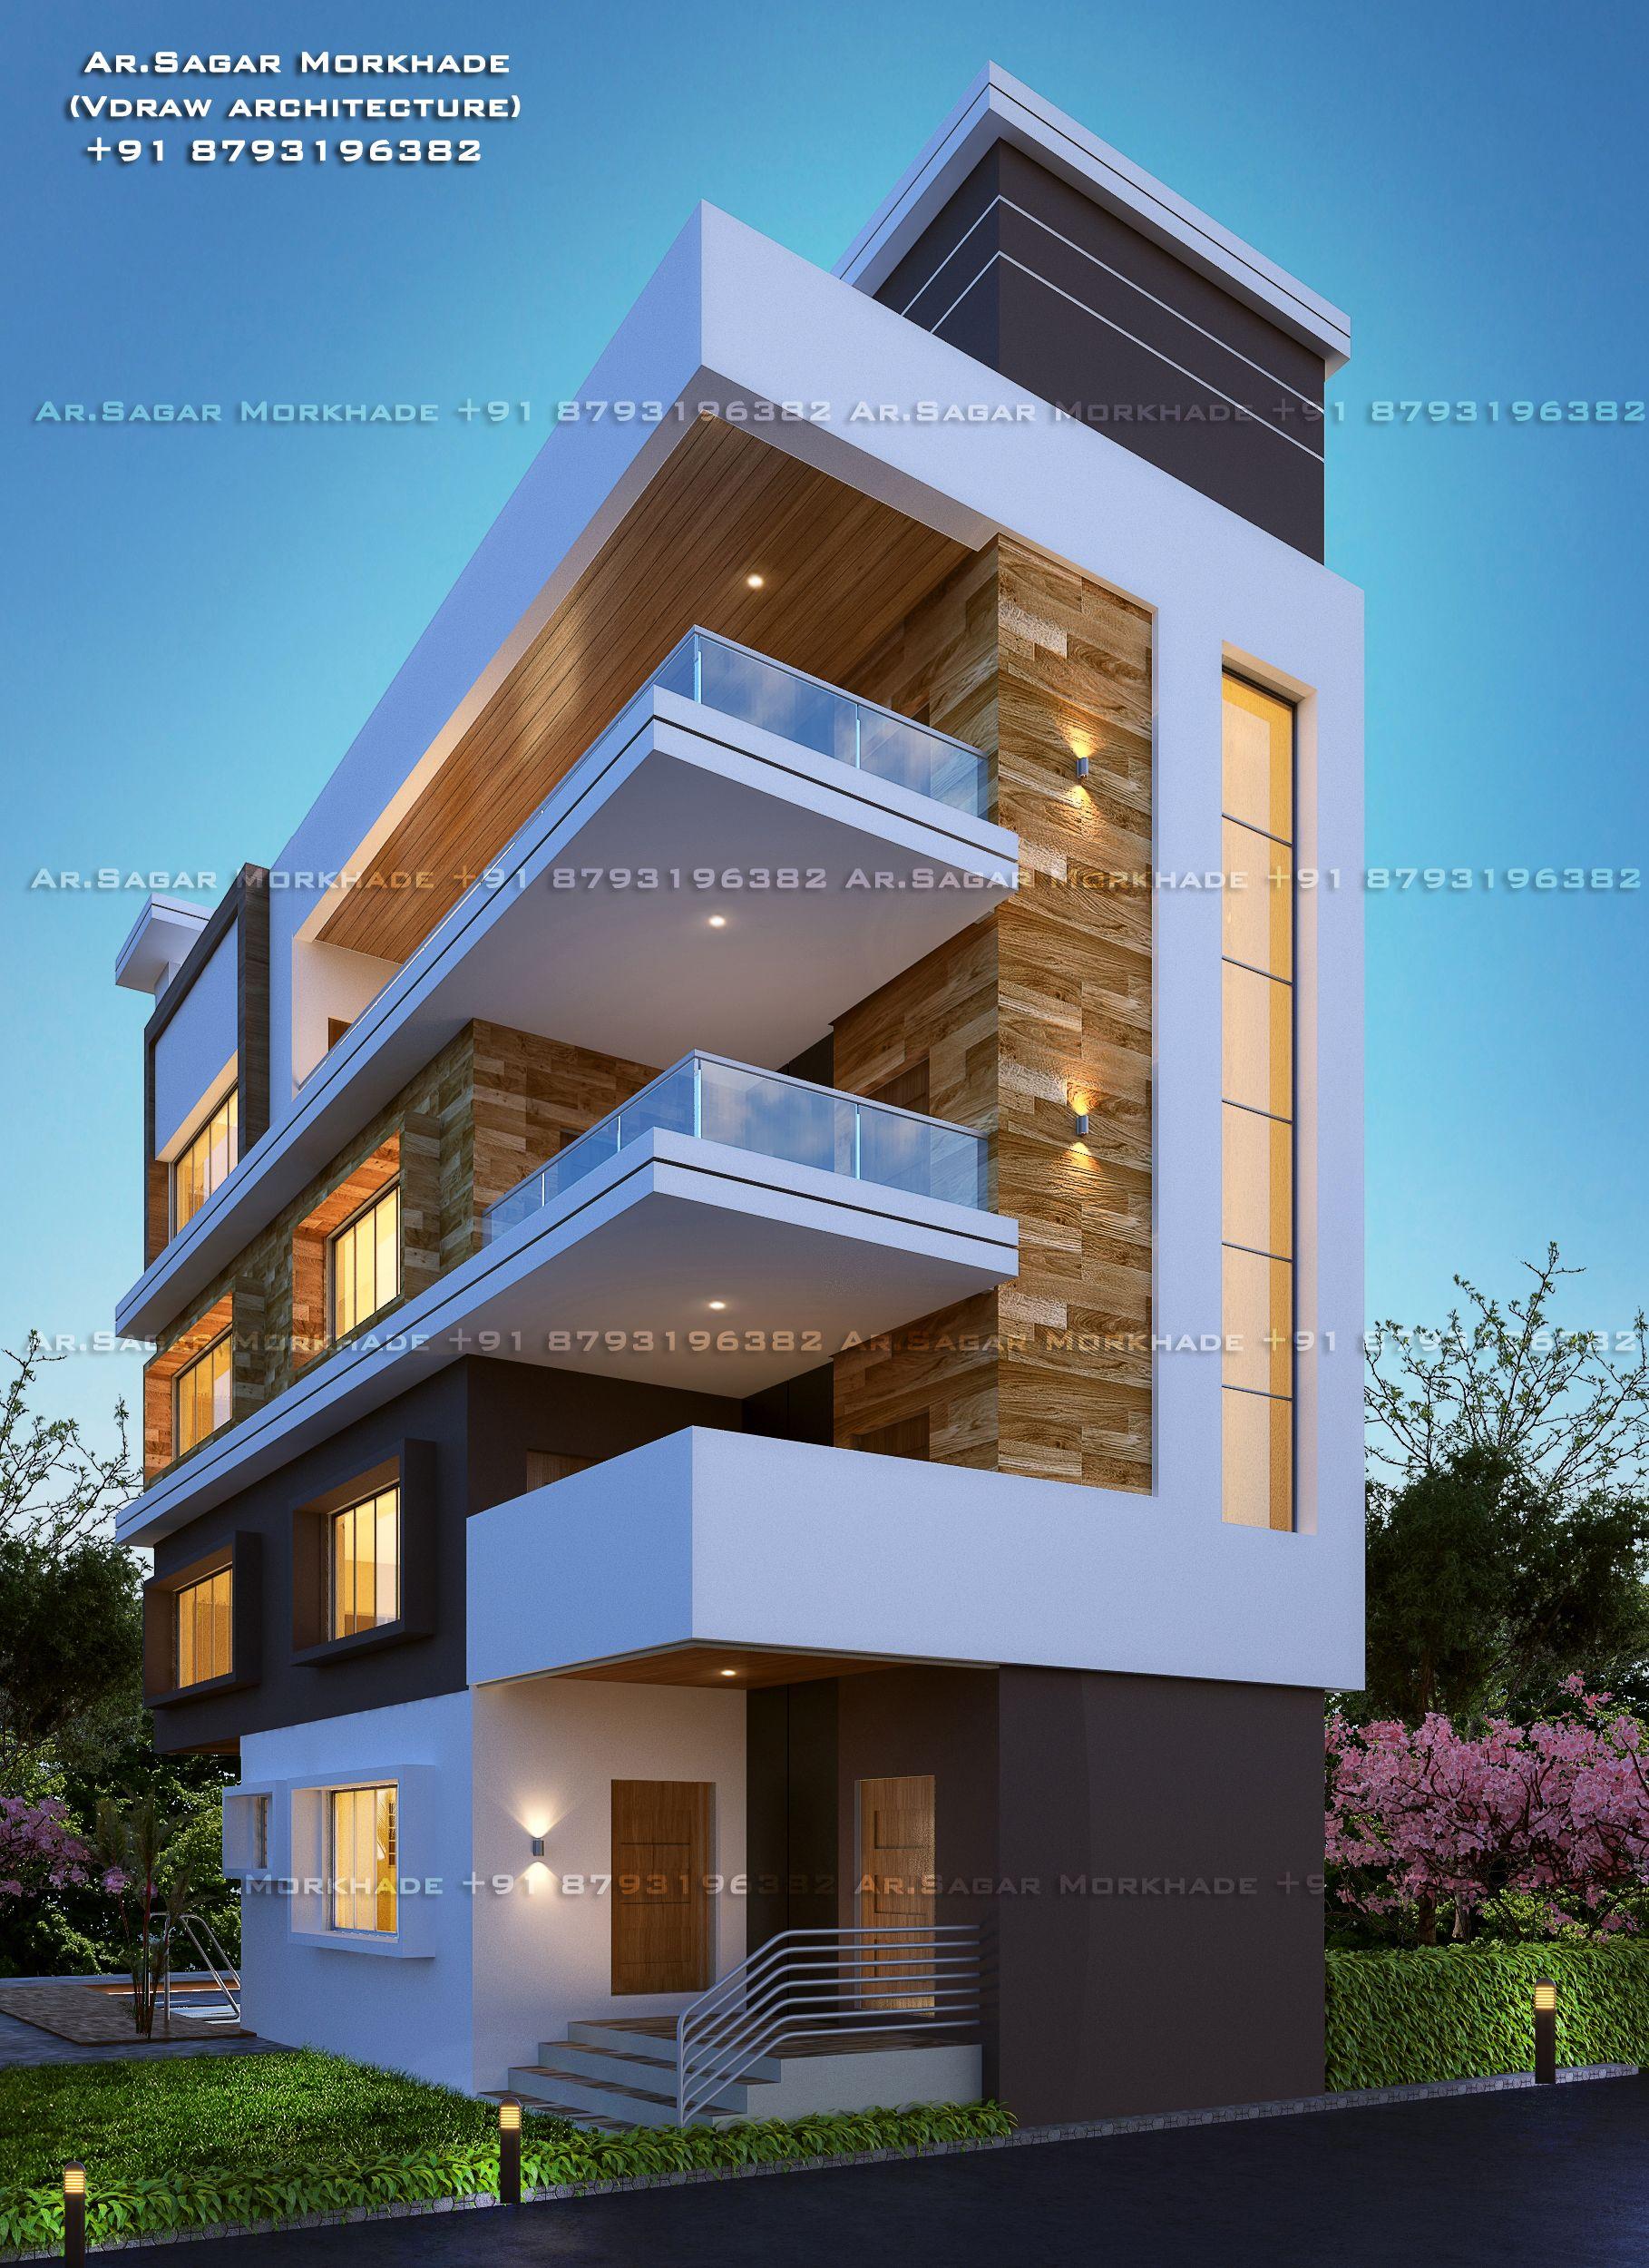 Modern House Bungalow Exterior By Ar Sagar Morkhade Vdraw Architecture 91 8793196382: #Contemporary#Modern #Residential #House #bungalow#Modern Architecture #Exterior By, Ar.Saga